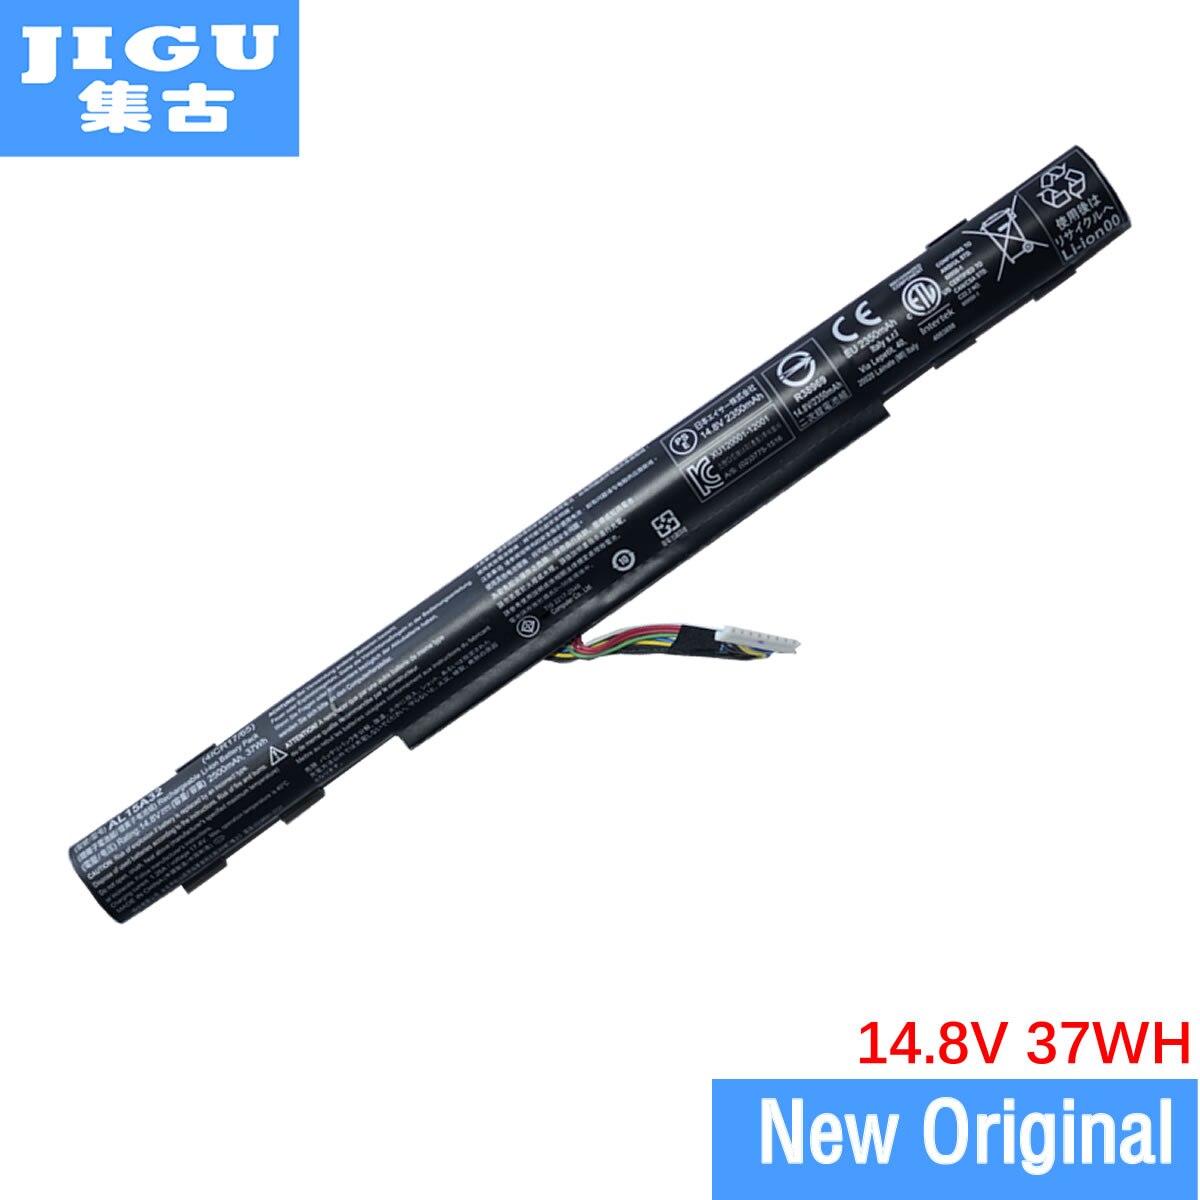 JIGU AL15A32 Batterie D'ordinateur Portable D'origine Pour ACER Aspire V3-574G E5-473G E5-573G F5-572G 14.8 v 37WH